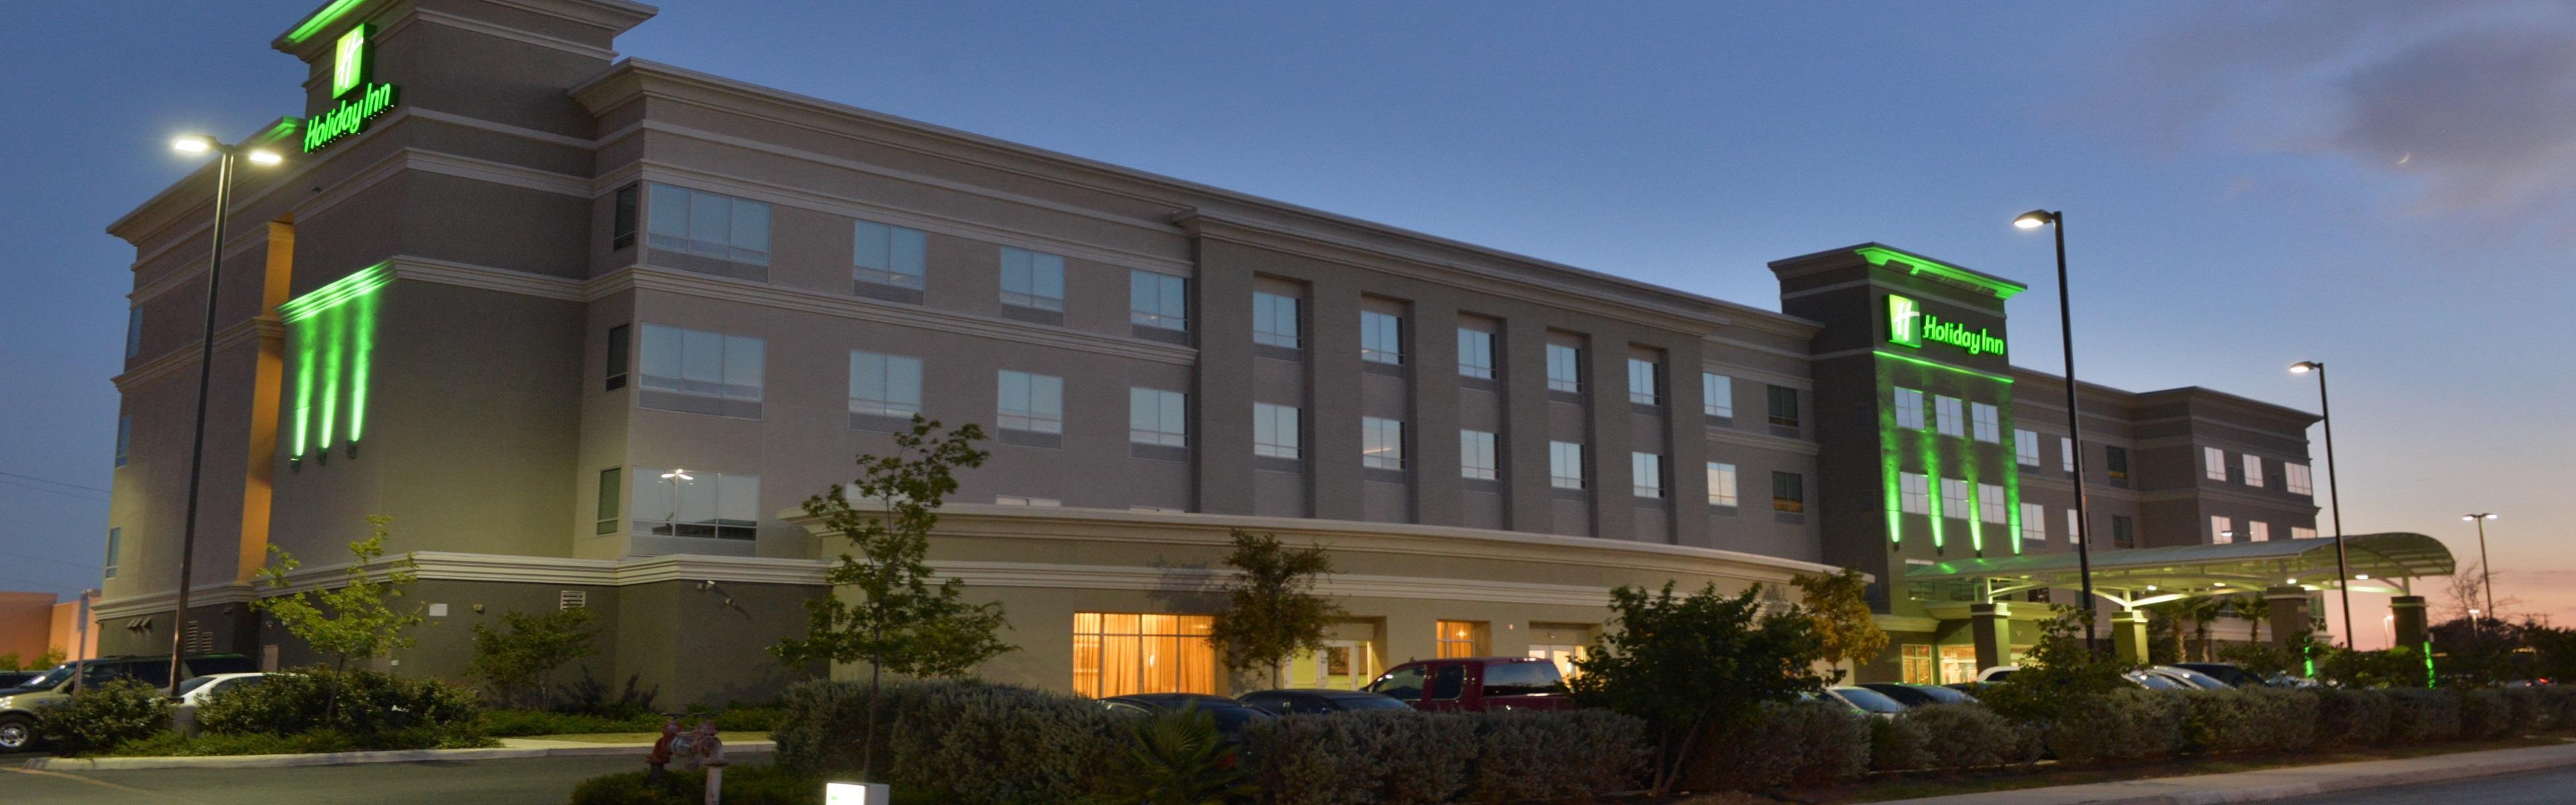 Mustang Inn San Antonio Tx Holiday Inn San Antonio